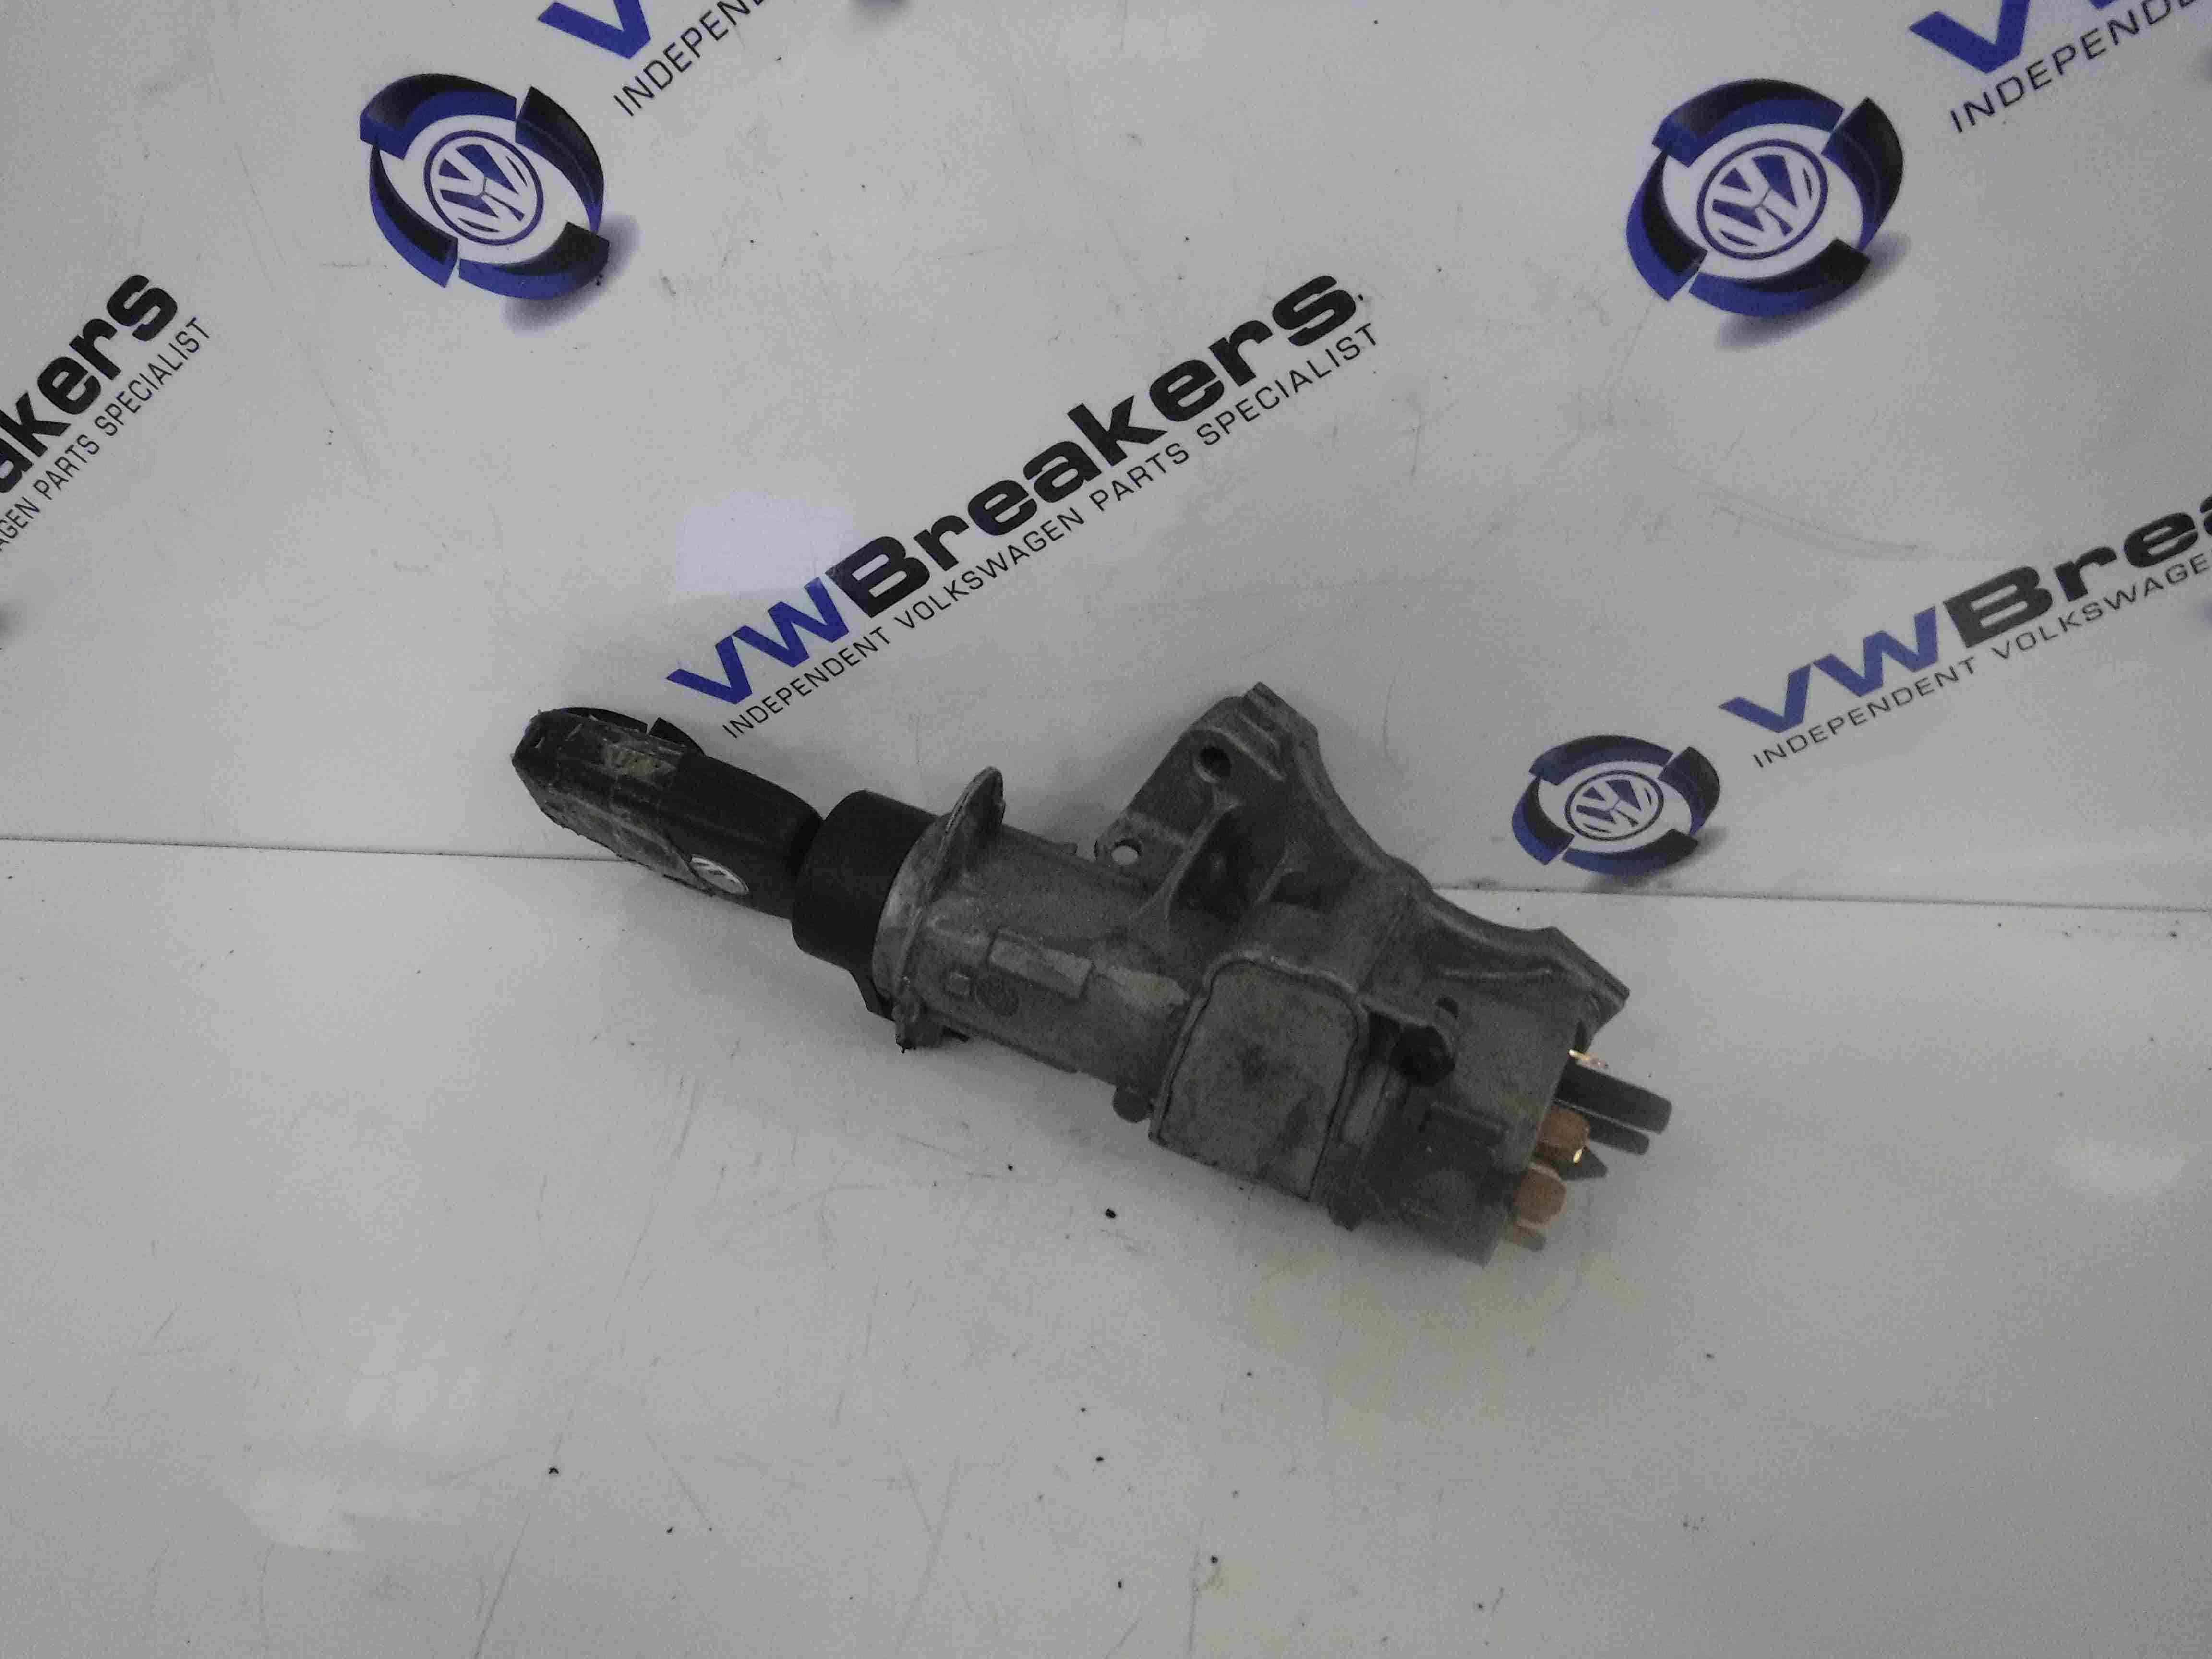 Volkswagen Passat 1996-2000 Ignition Barrel + Key 4B0905851A